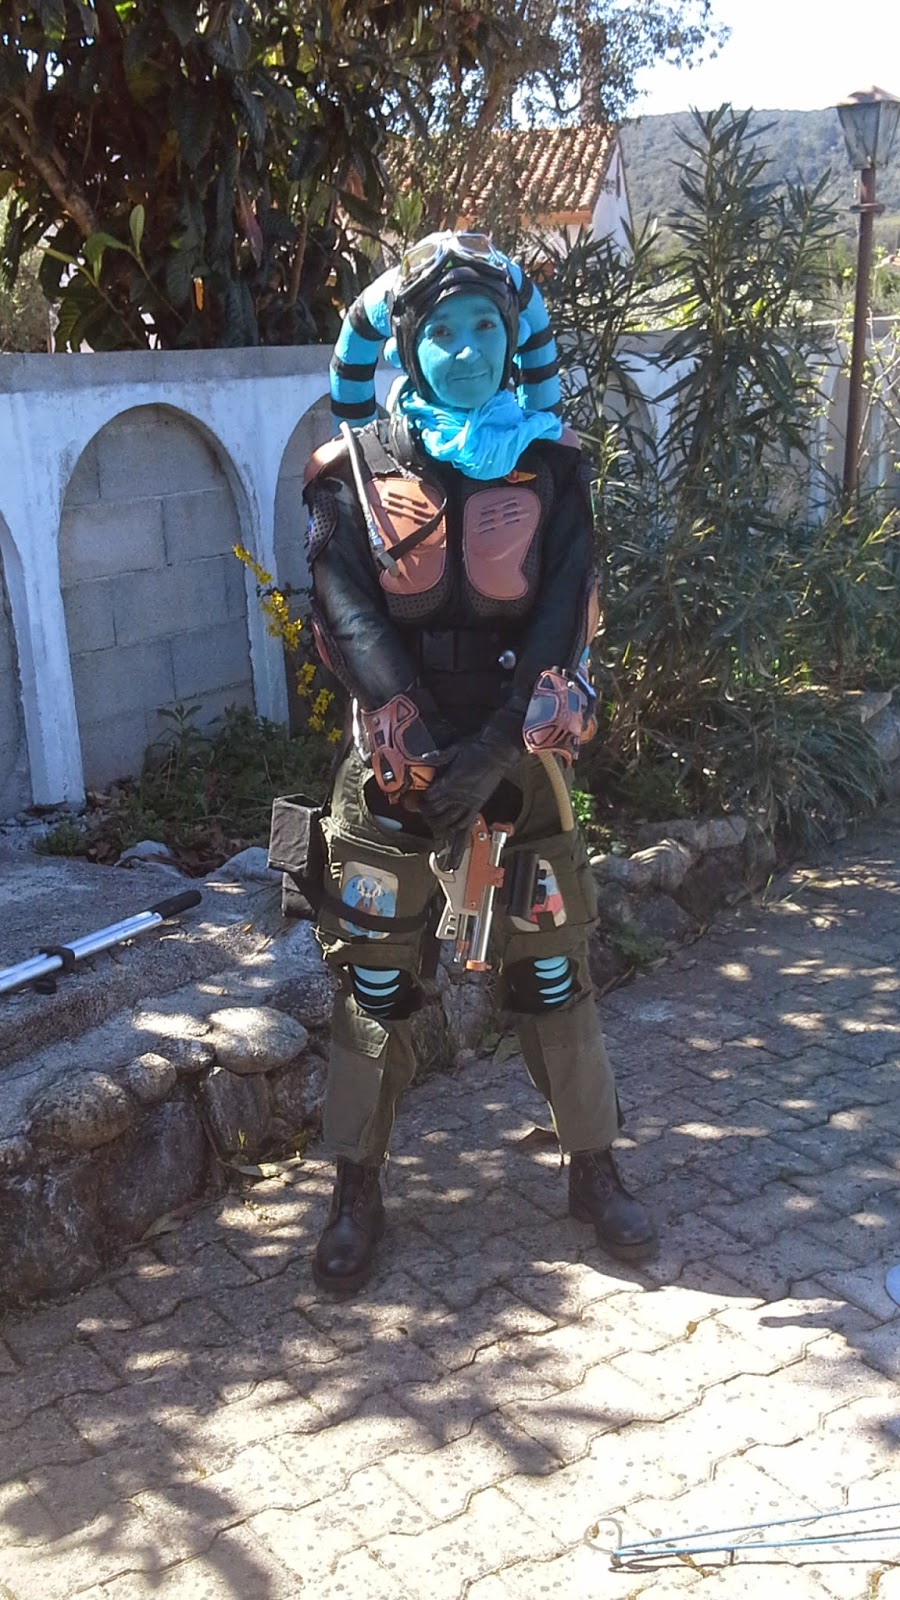 cosplay twi'lek